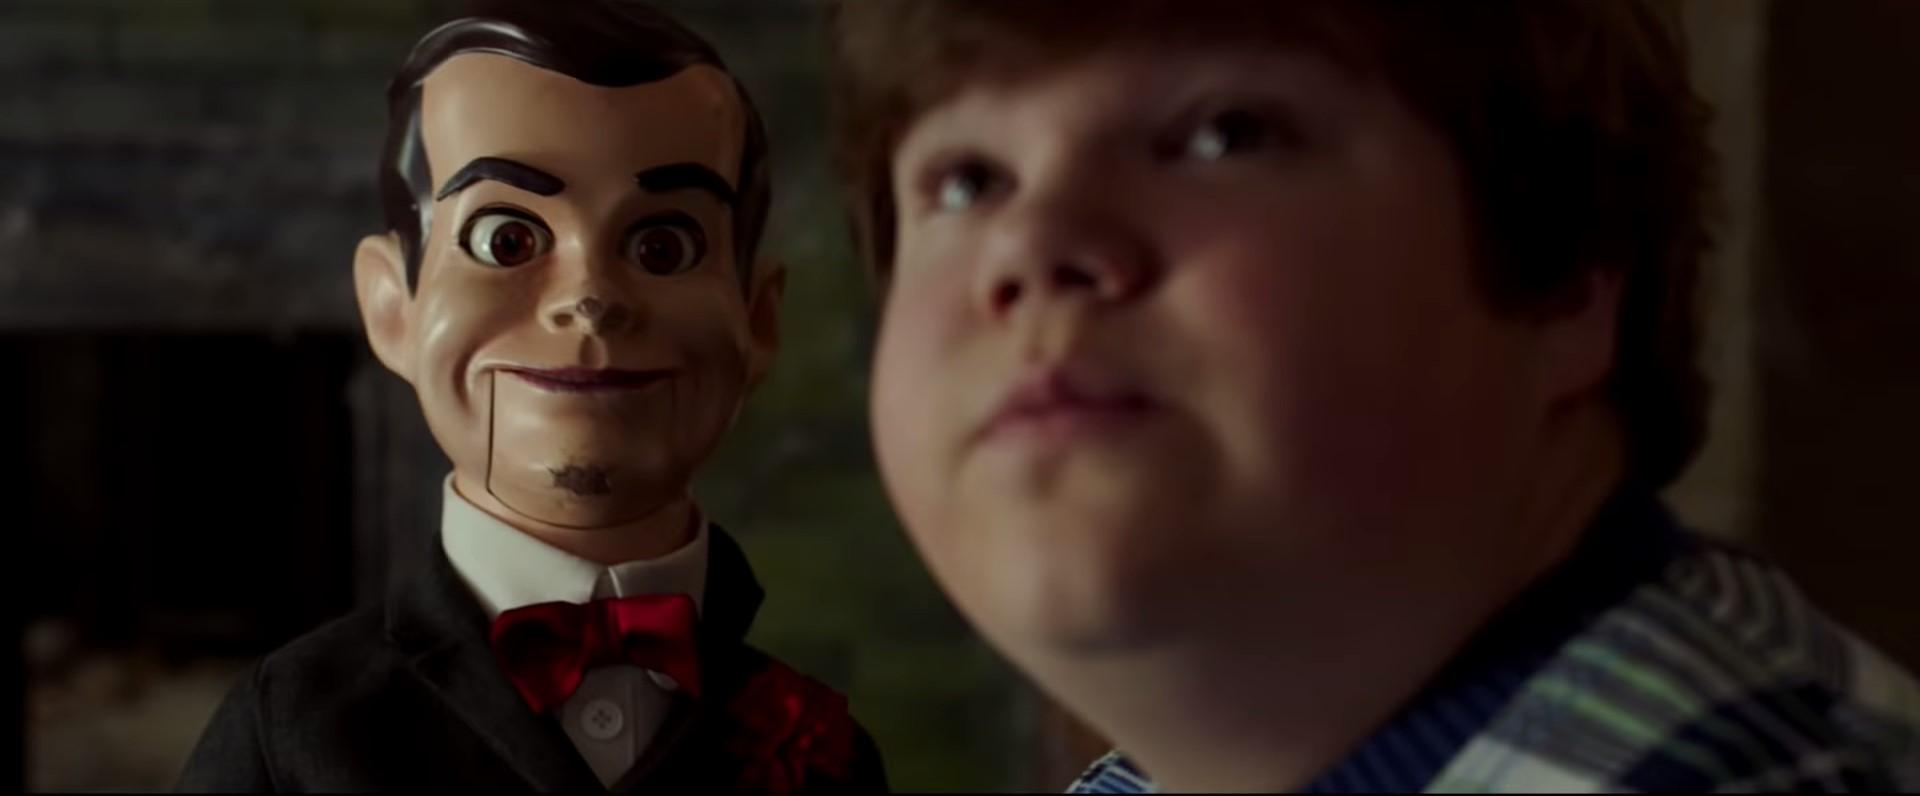 بررسی فیلم Goosebumps 2: Haunted Halloween